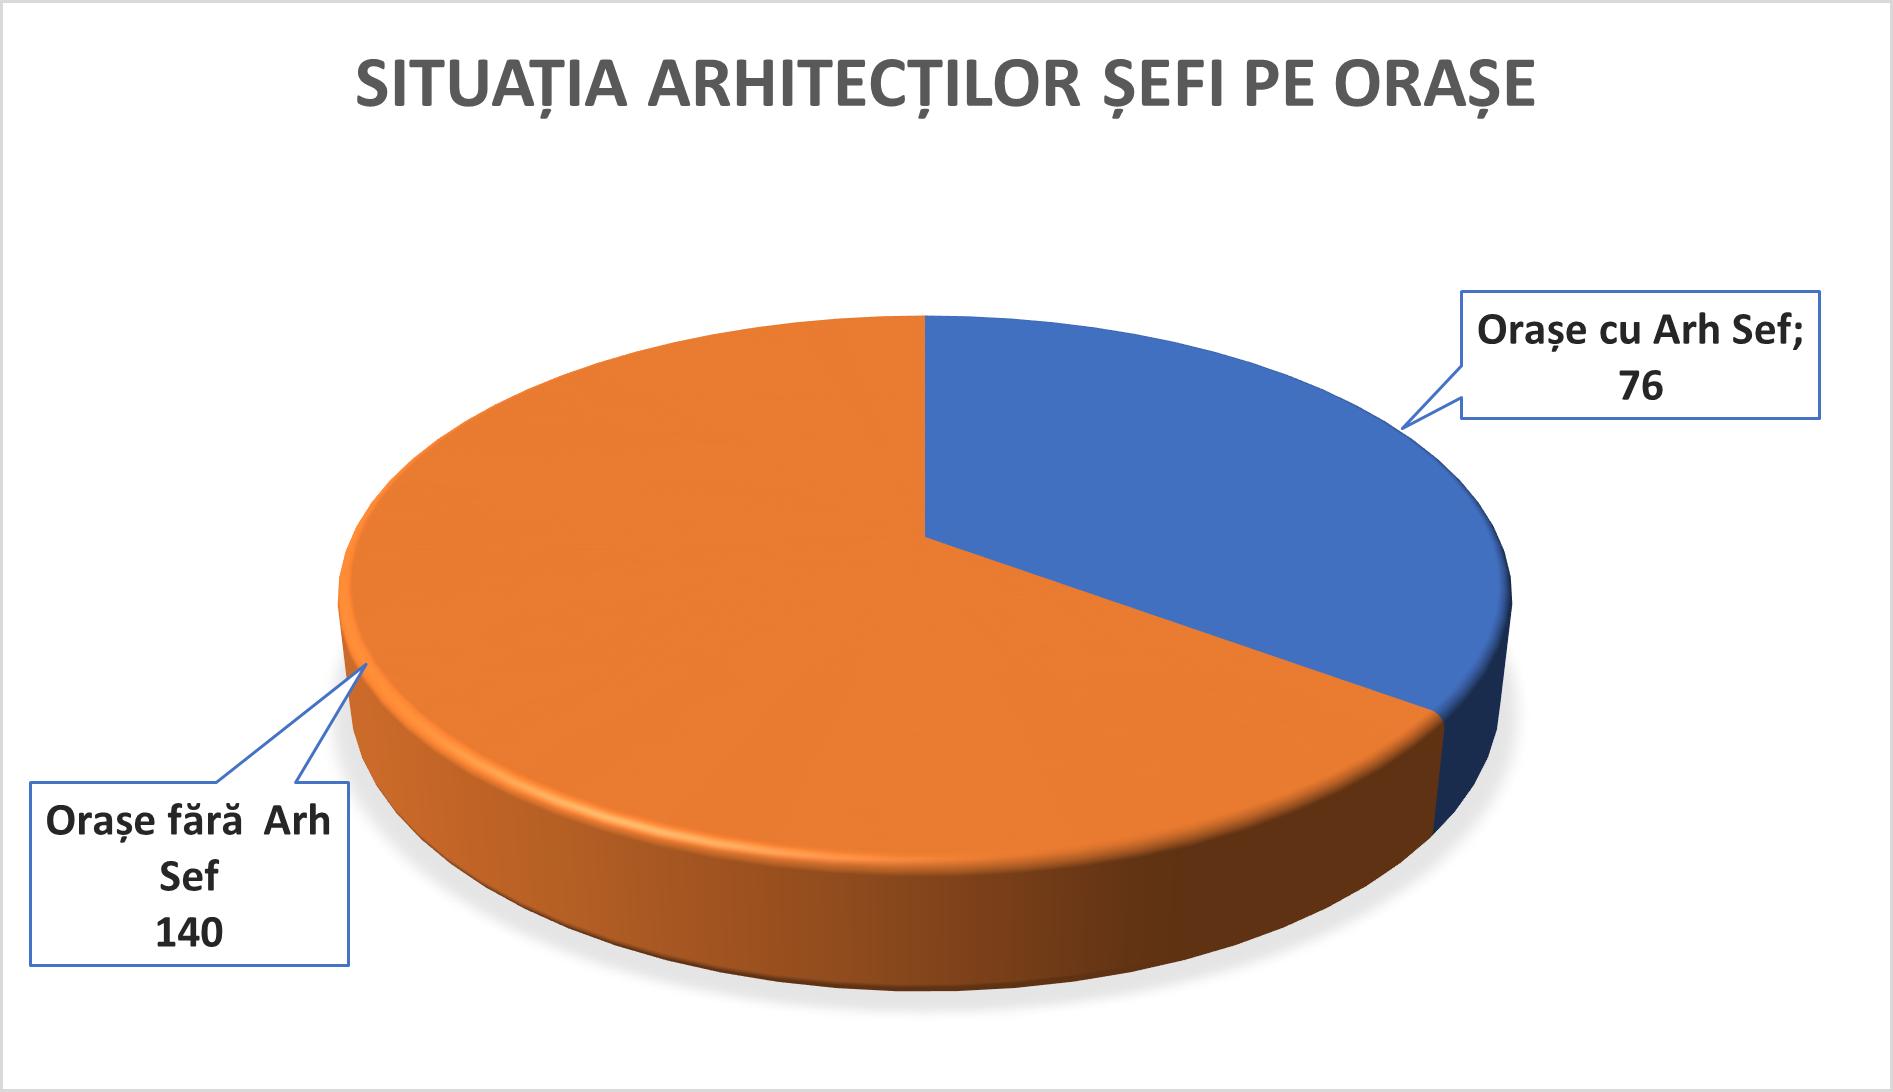 4-situatia-arhitecti-sefi-pe-orase